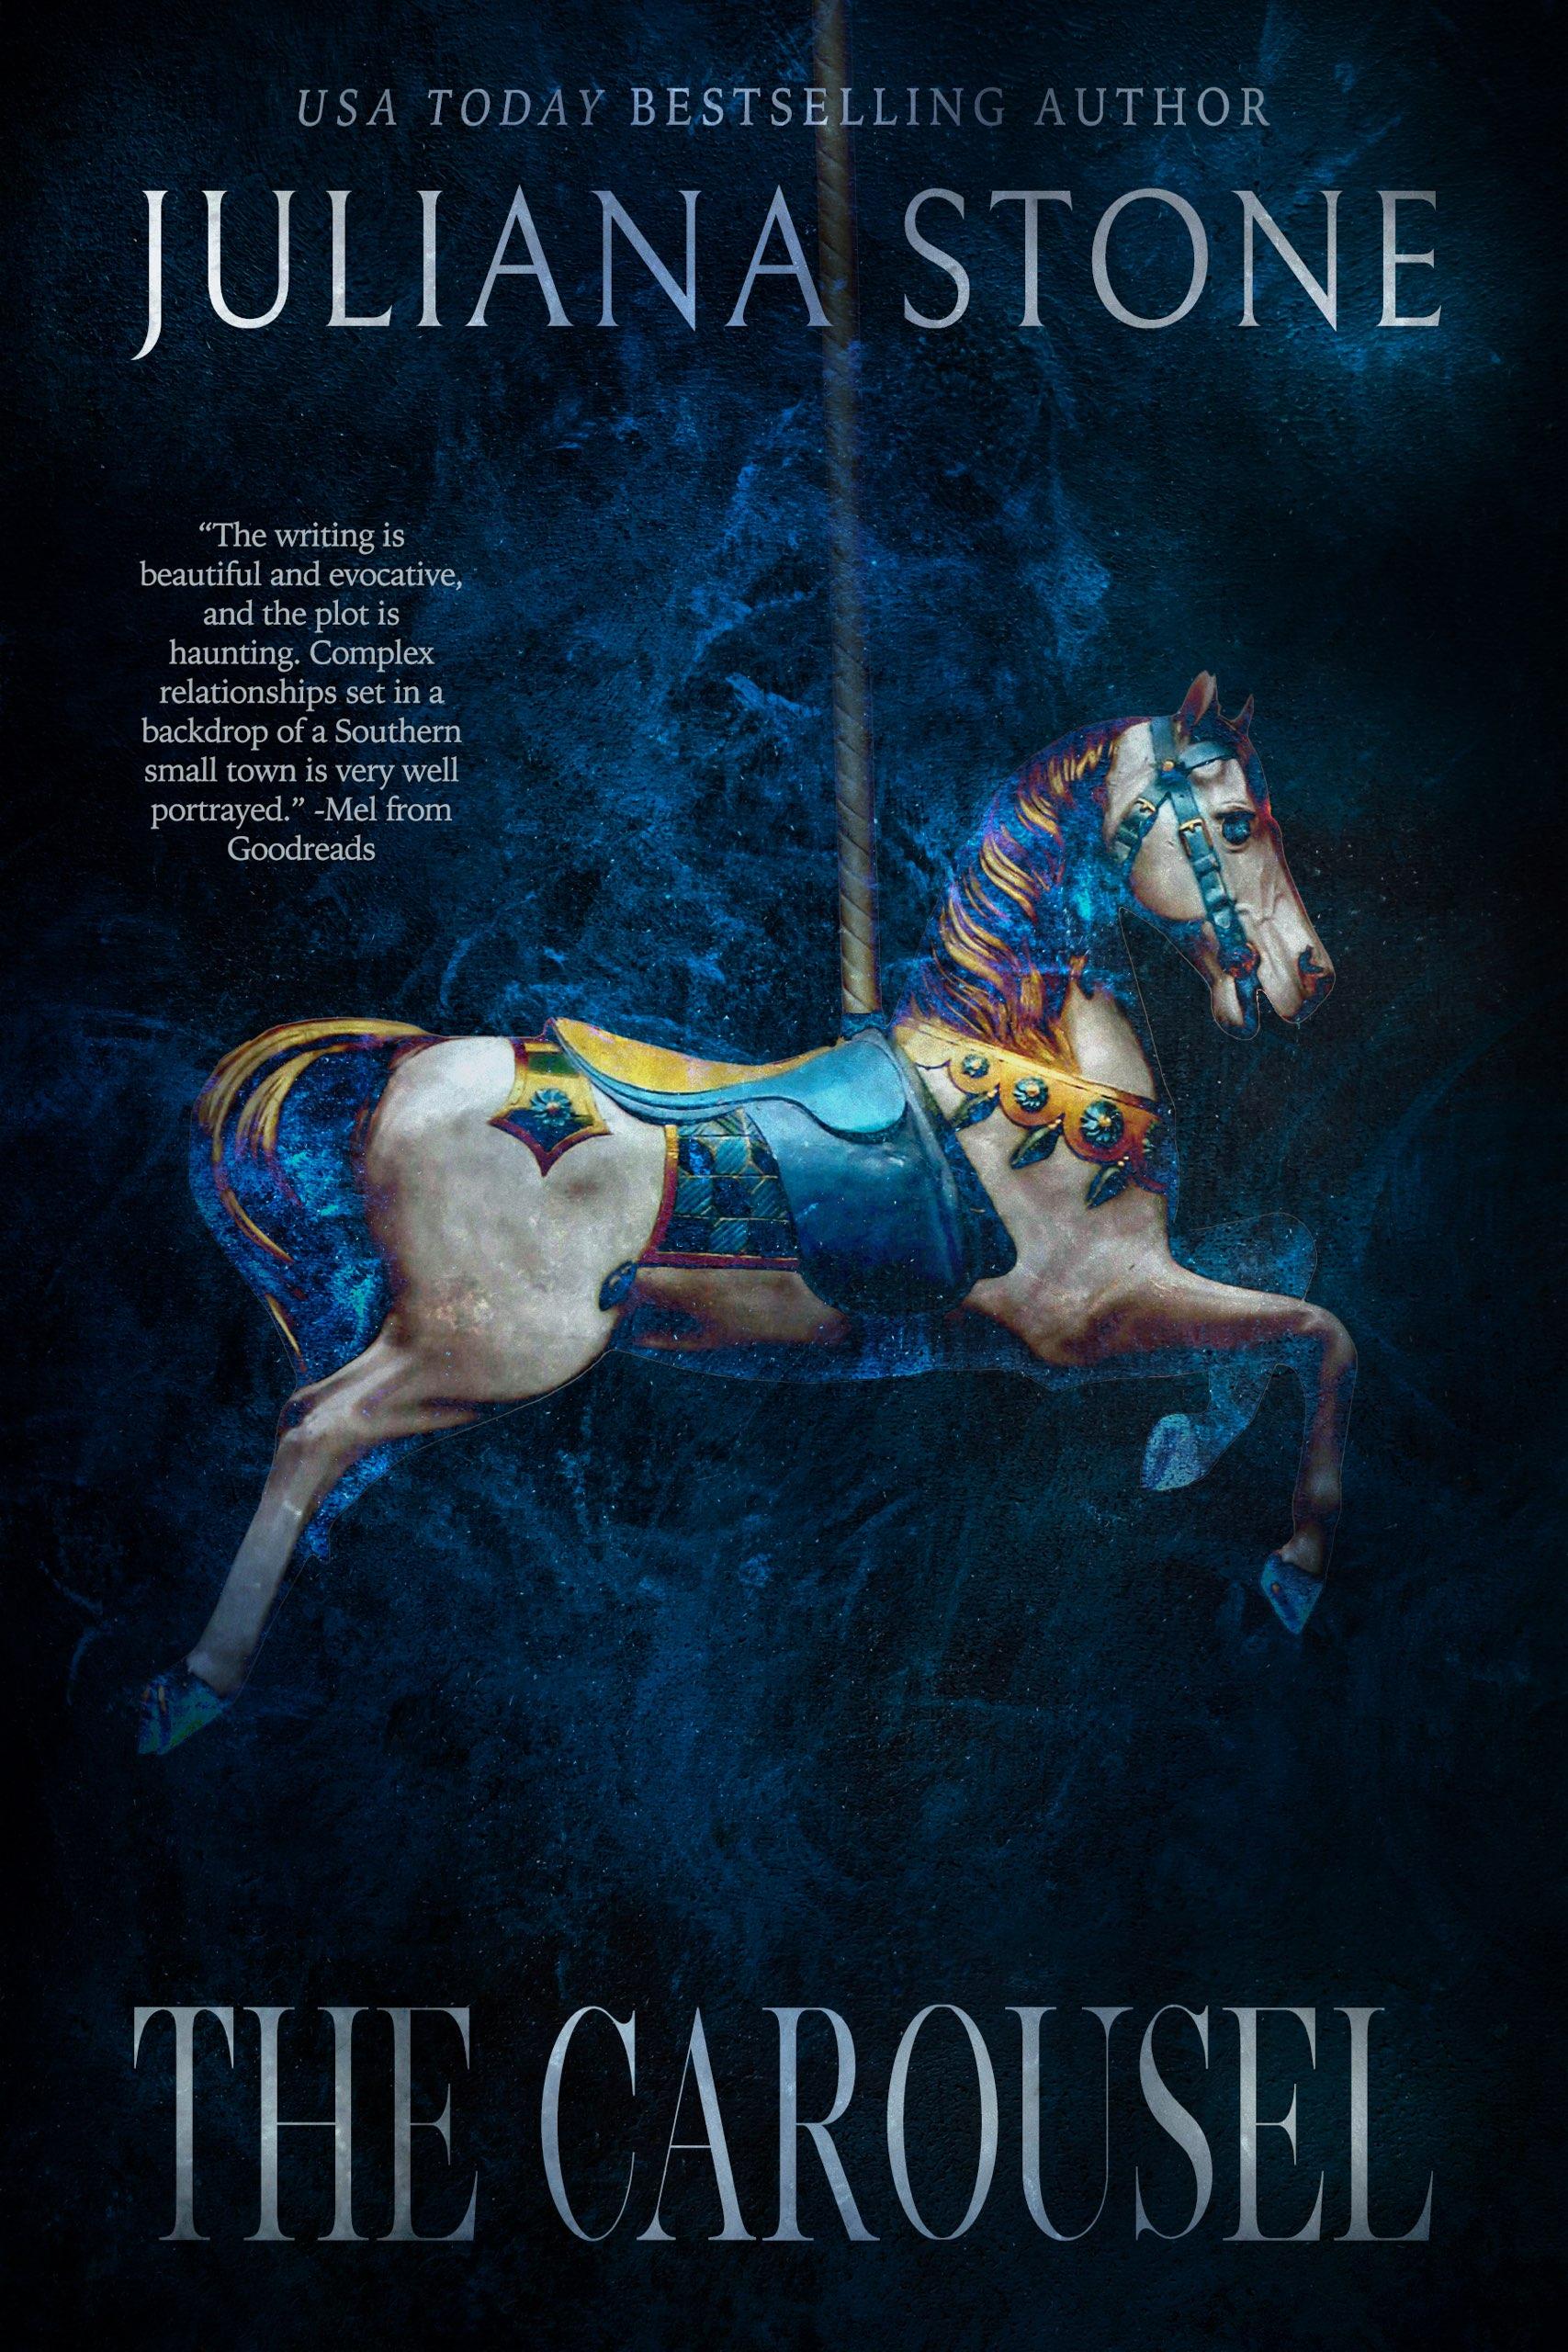 The Carousel by Juliana Stone